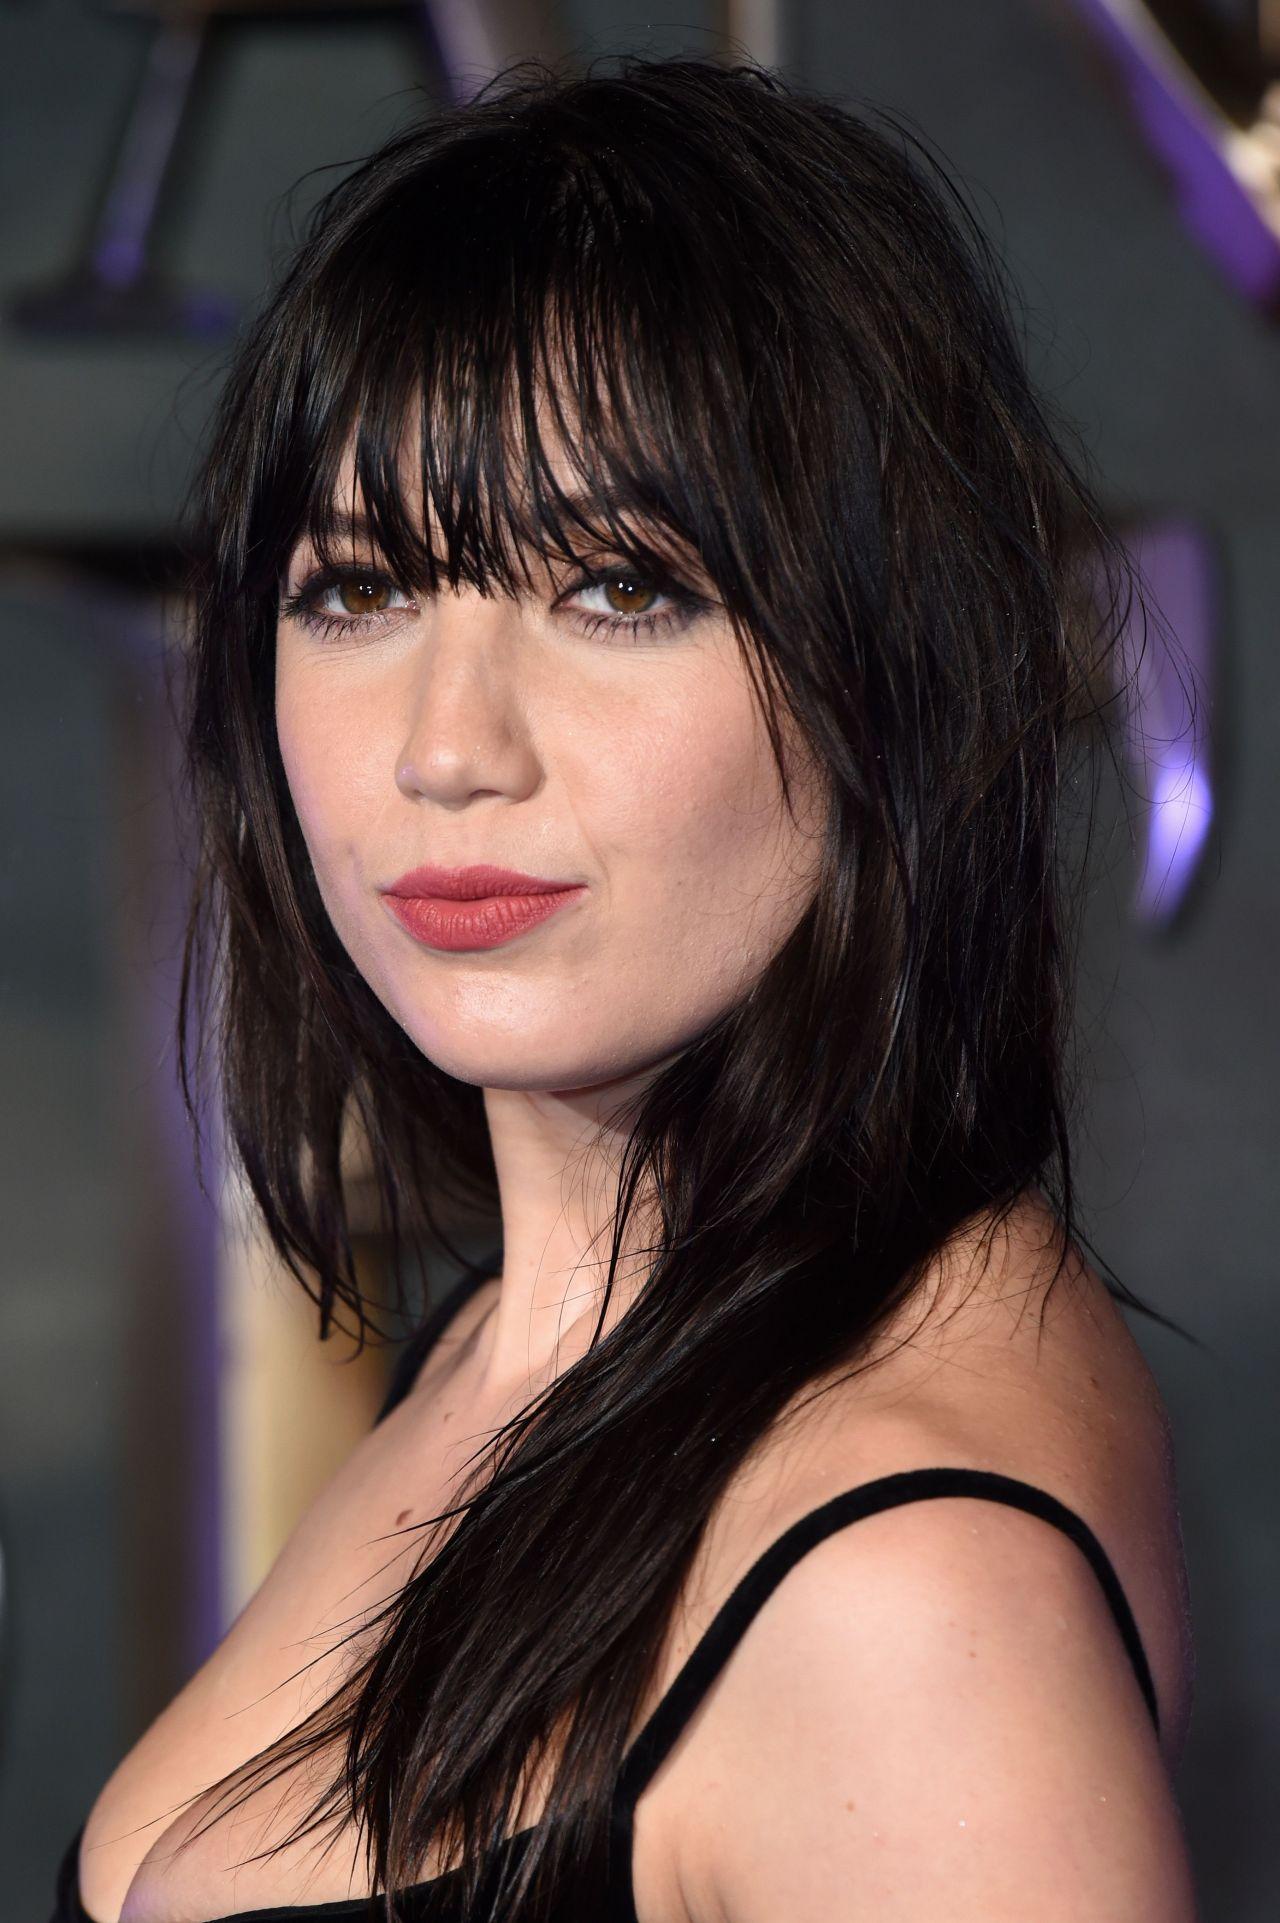 Melissa Monet